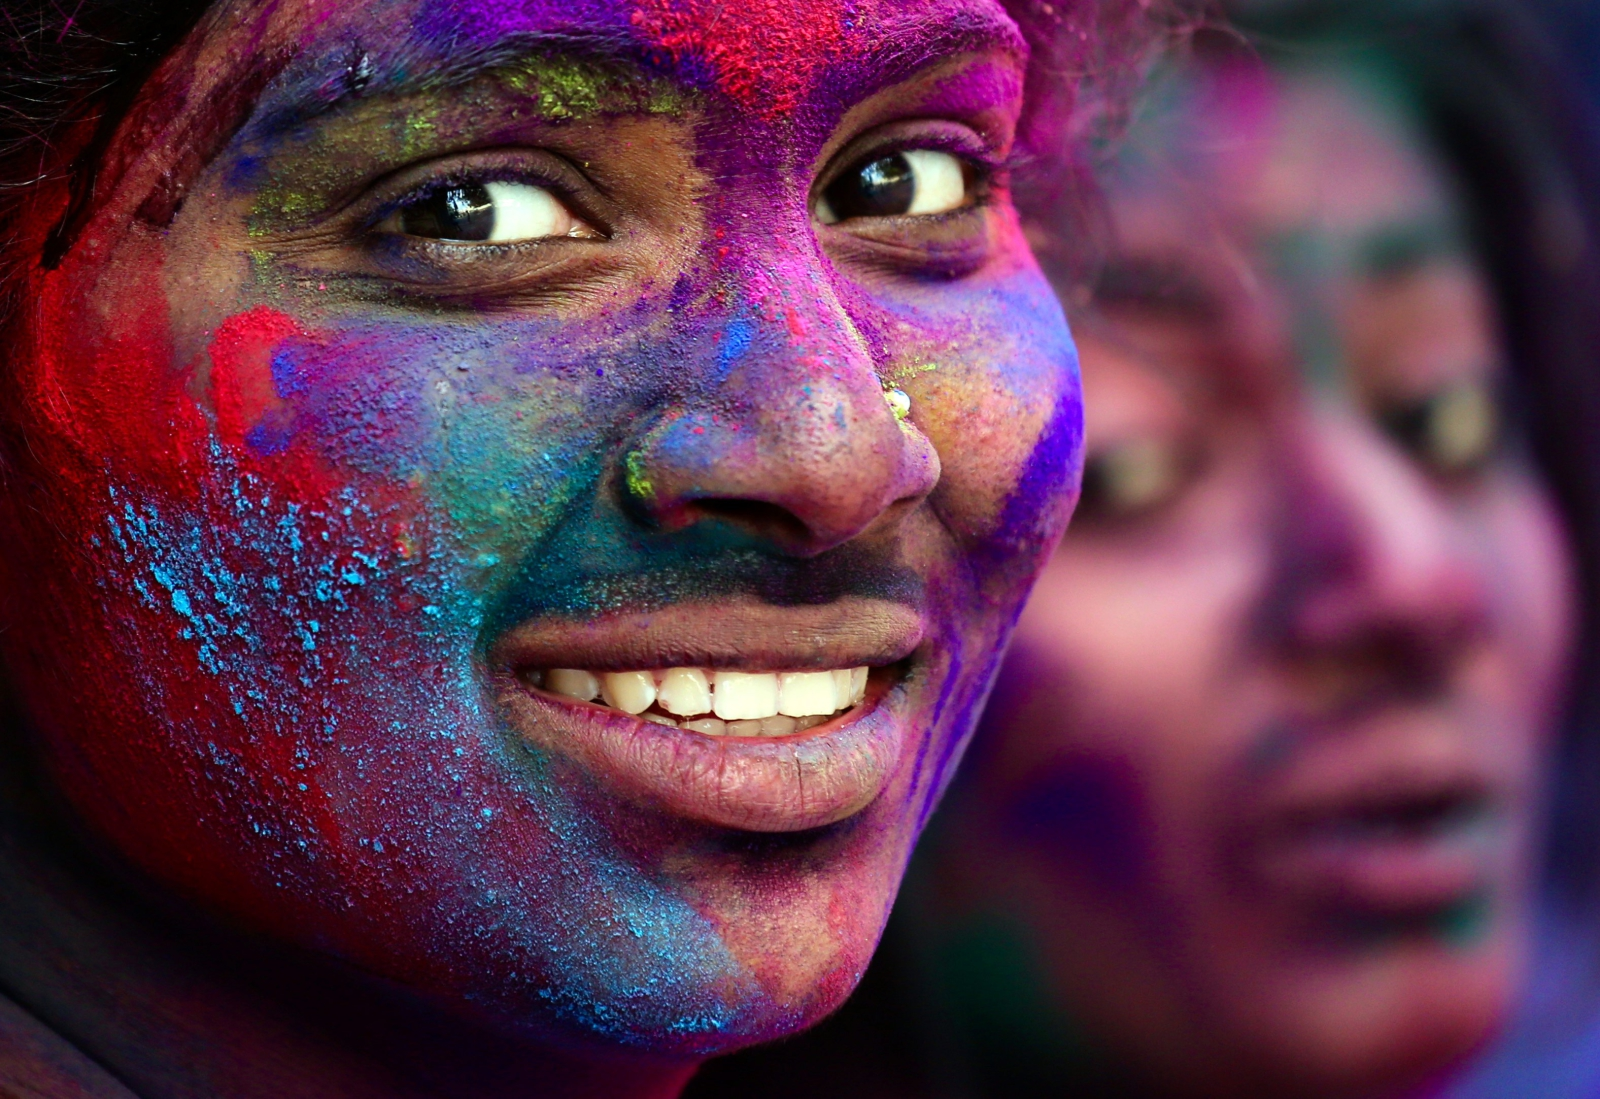 Święty festiwal hinduski w Bangalore. Fot. PAP/EPA/JAGADEESH NV